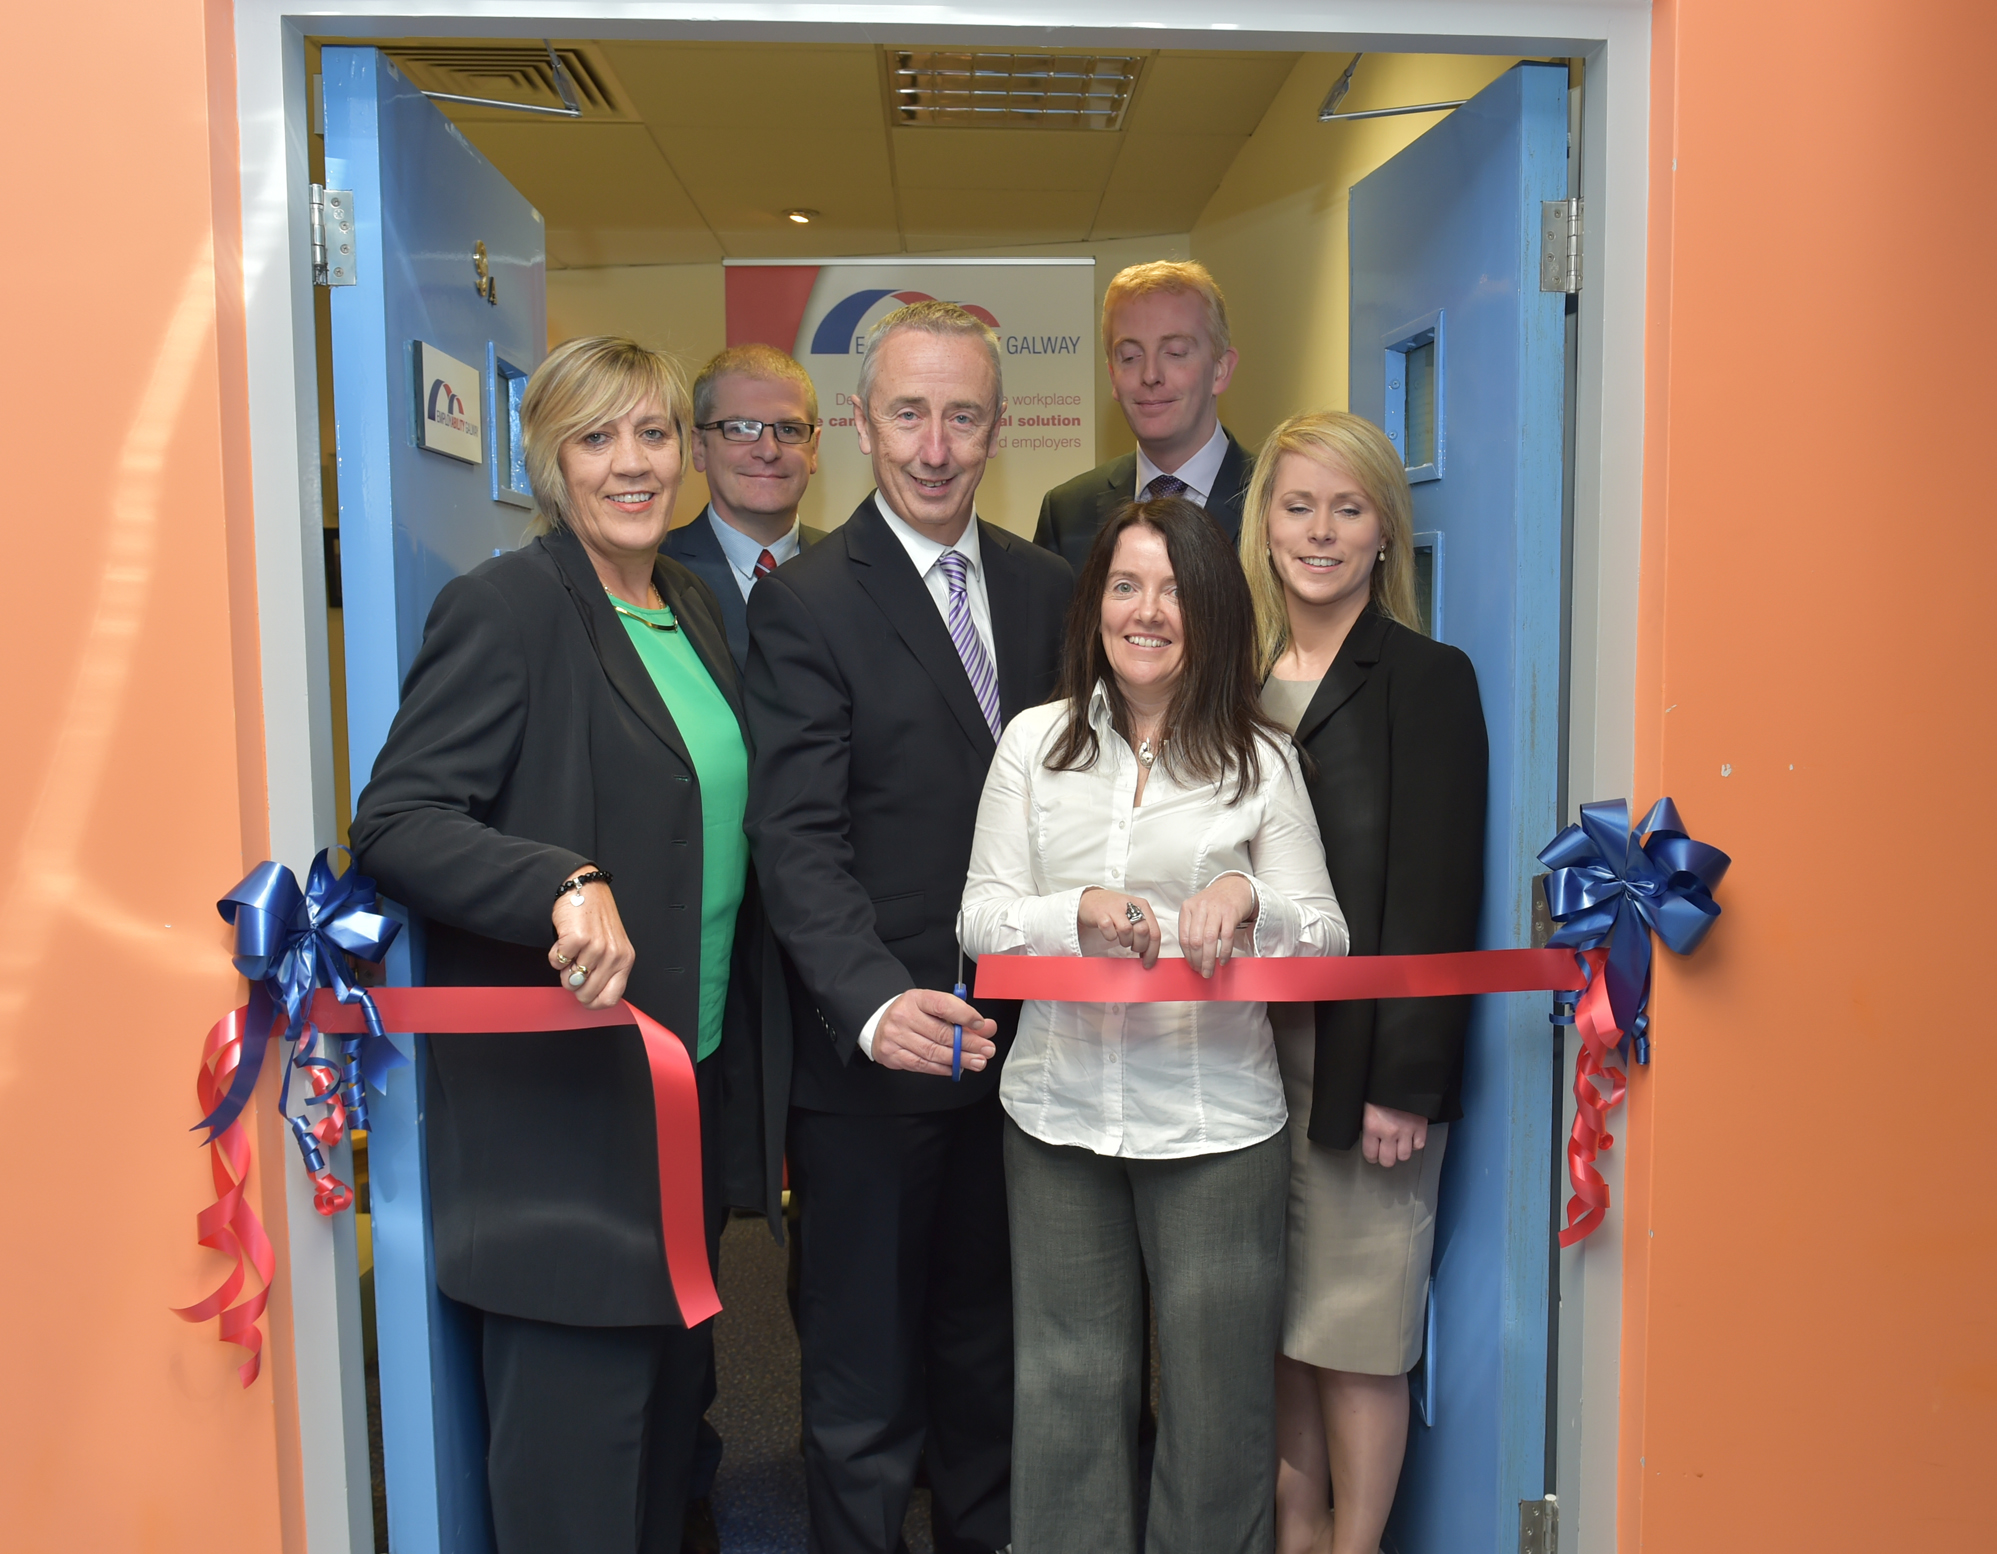 DSC_3604 - Version 2 55EmployAbility Galway Office Opening.jpg